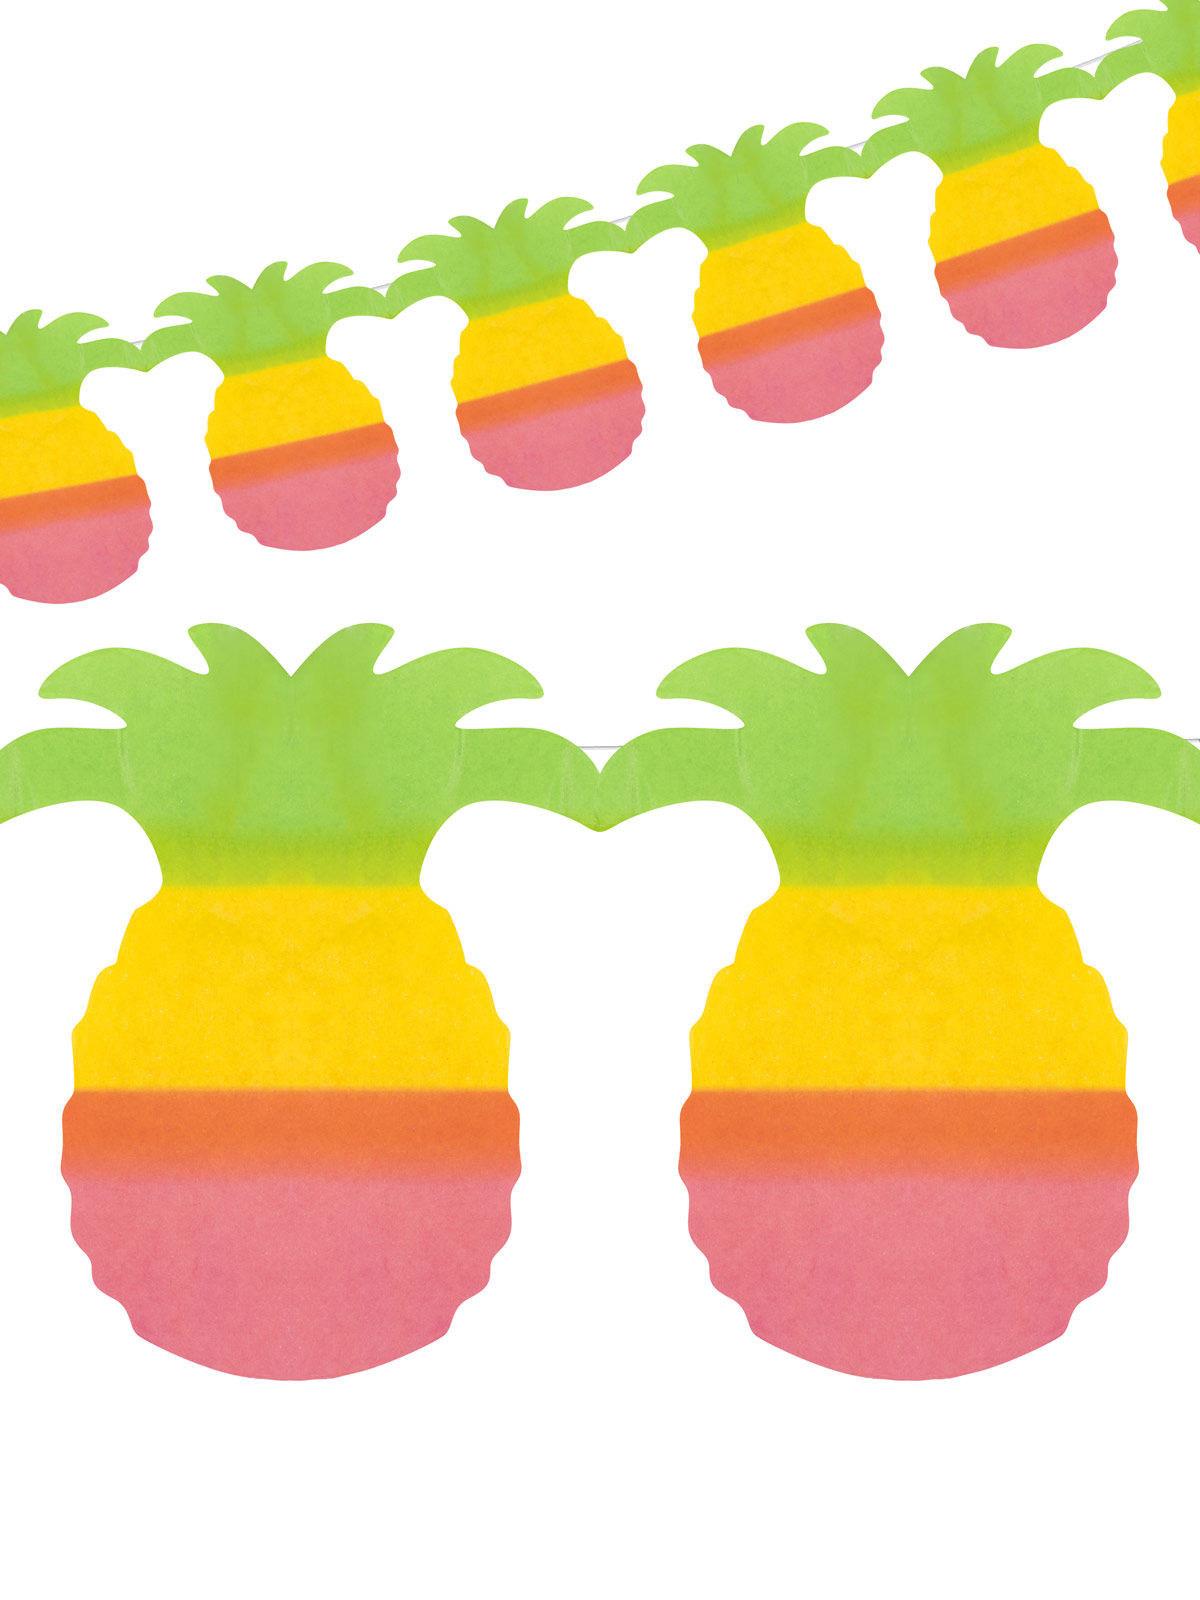 Décoration de fête hawaïenne guirlande ananas